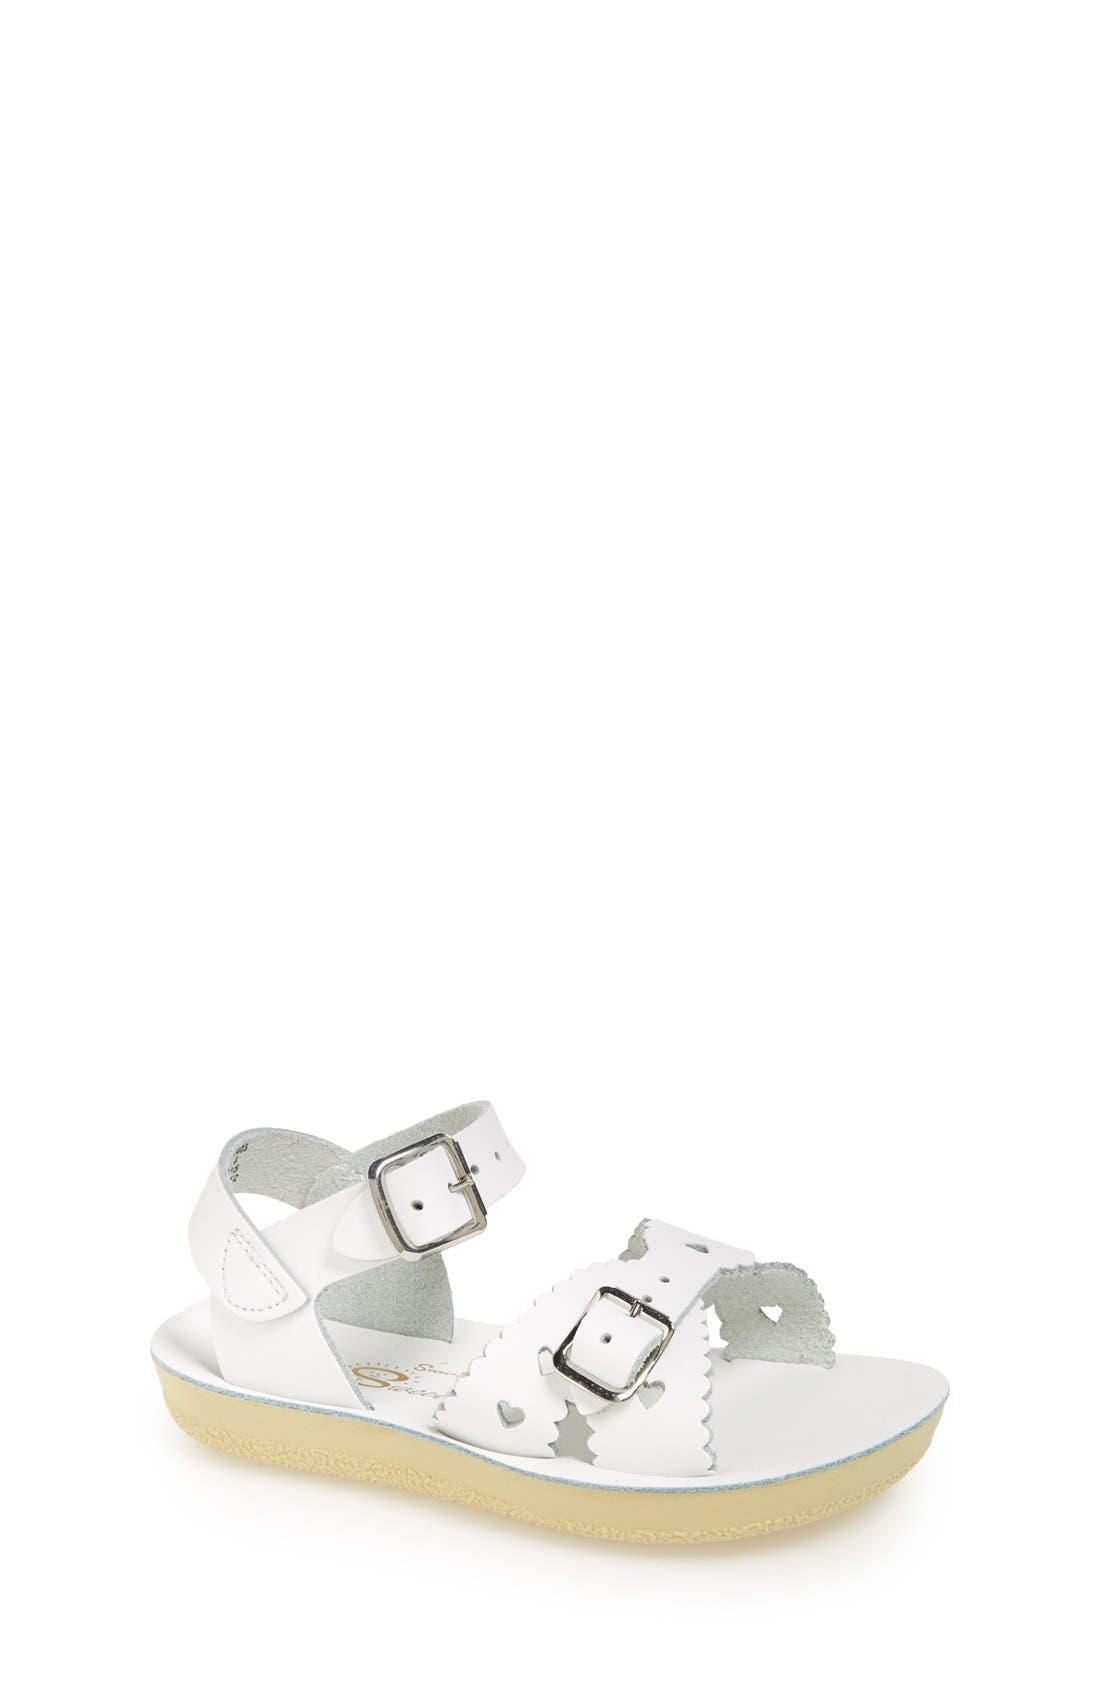 Salt Water Sandals by Hoy 'Sweetheart' Sandal (Walker, Toddler & Little Kid)